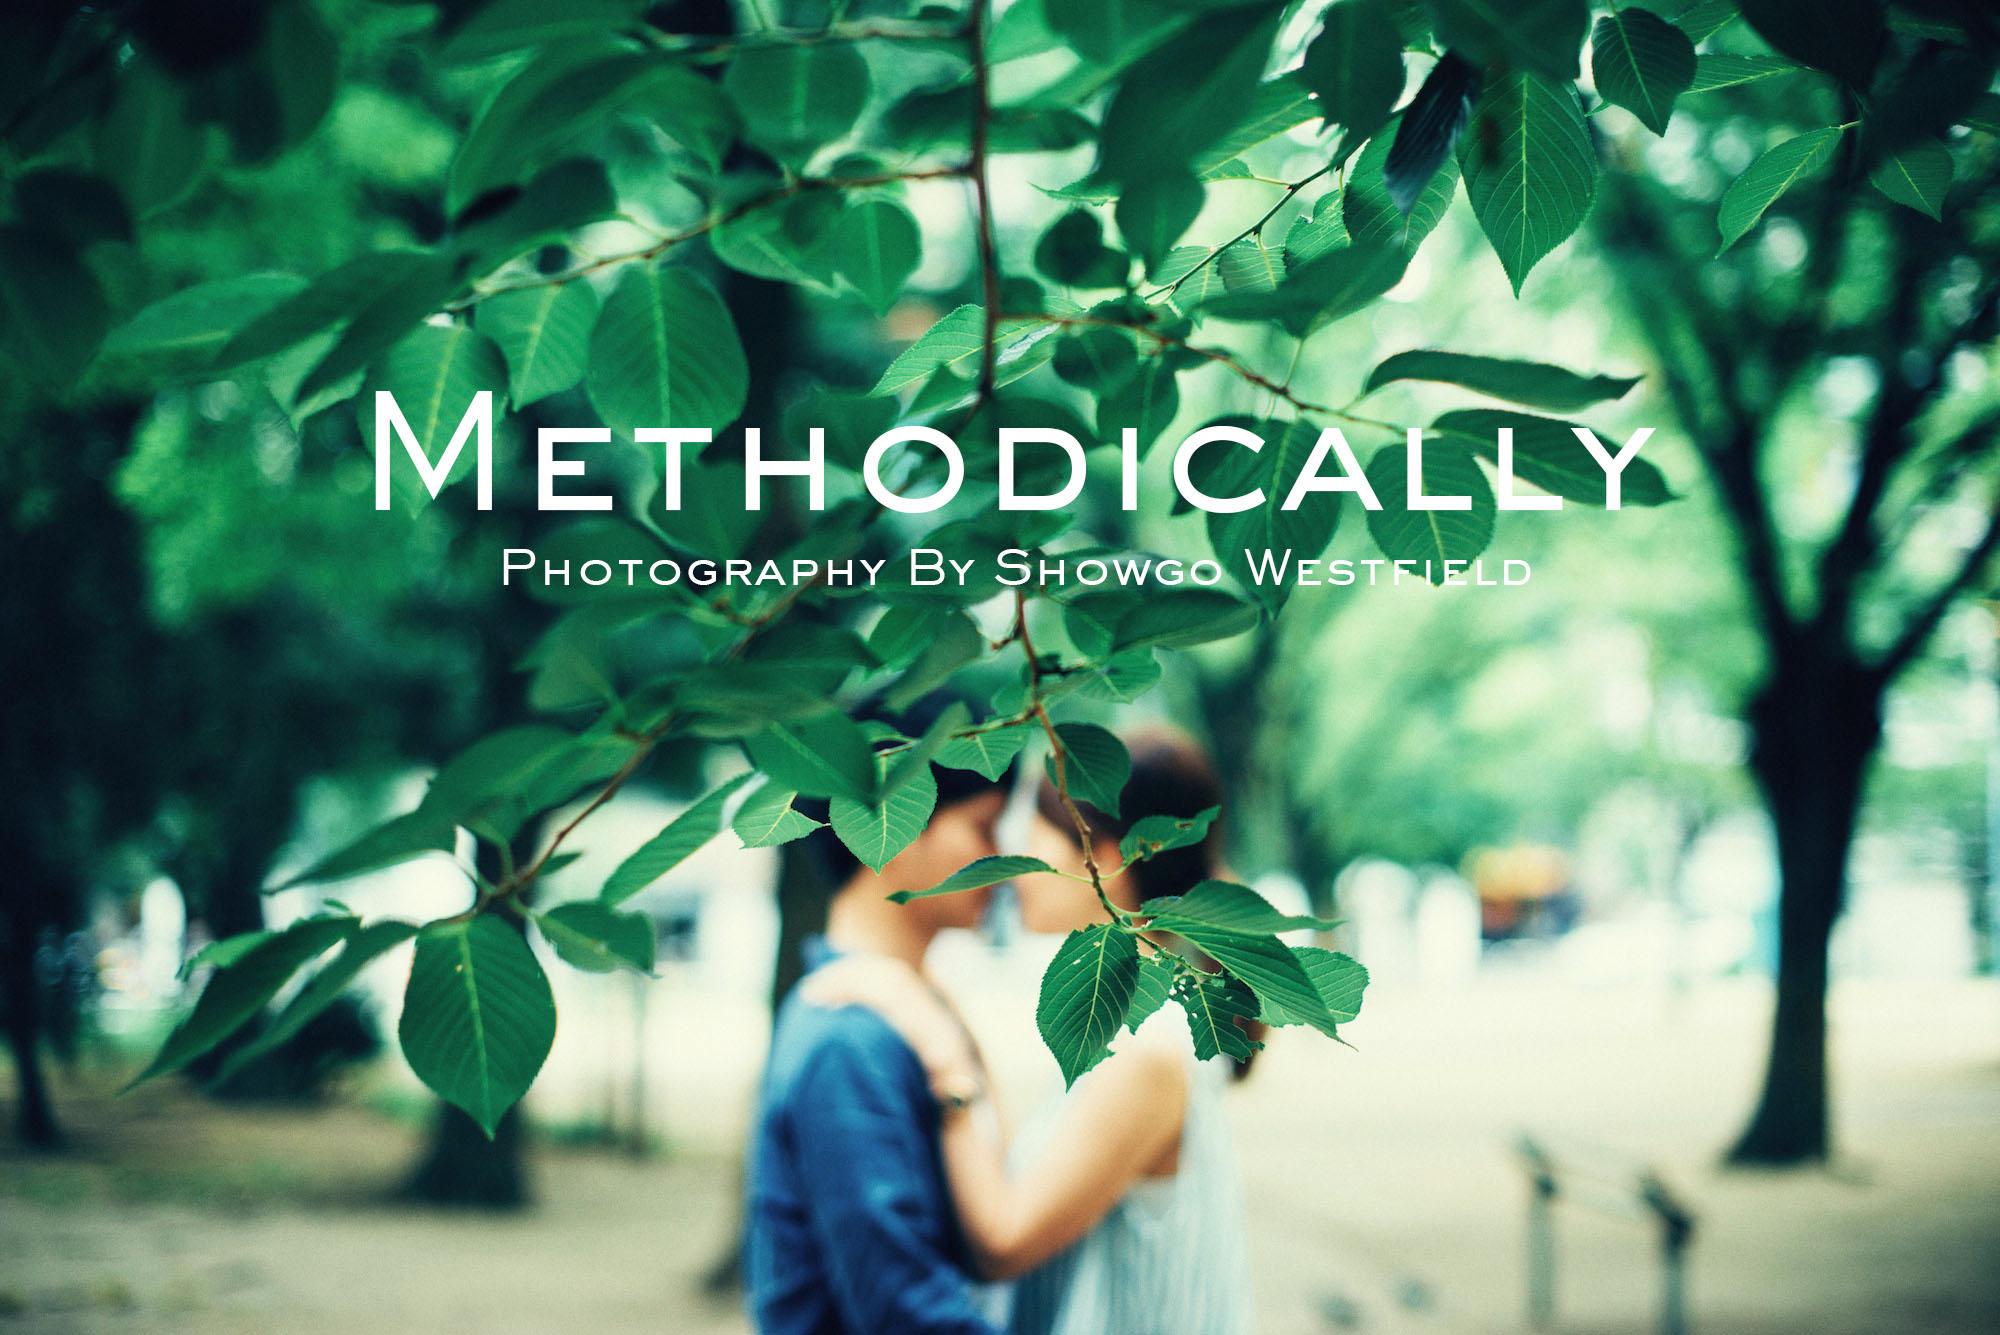 Methodically